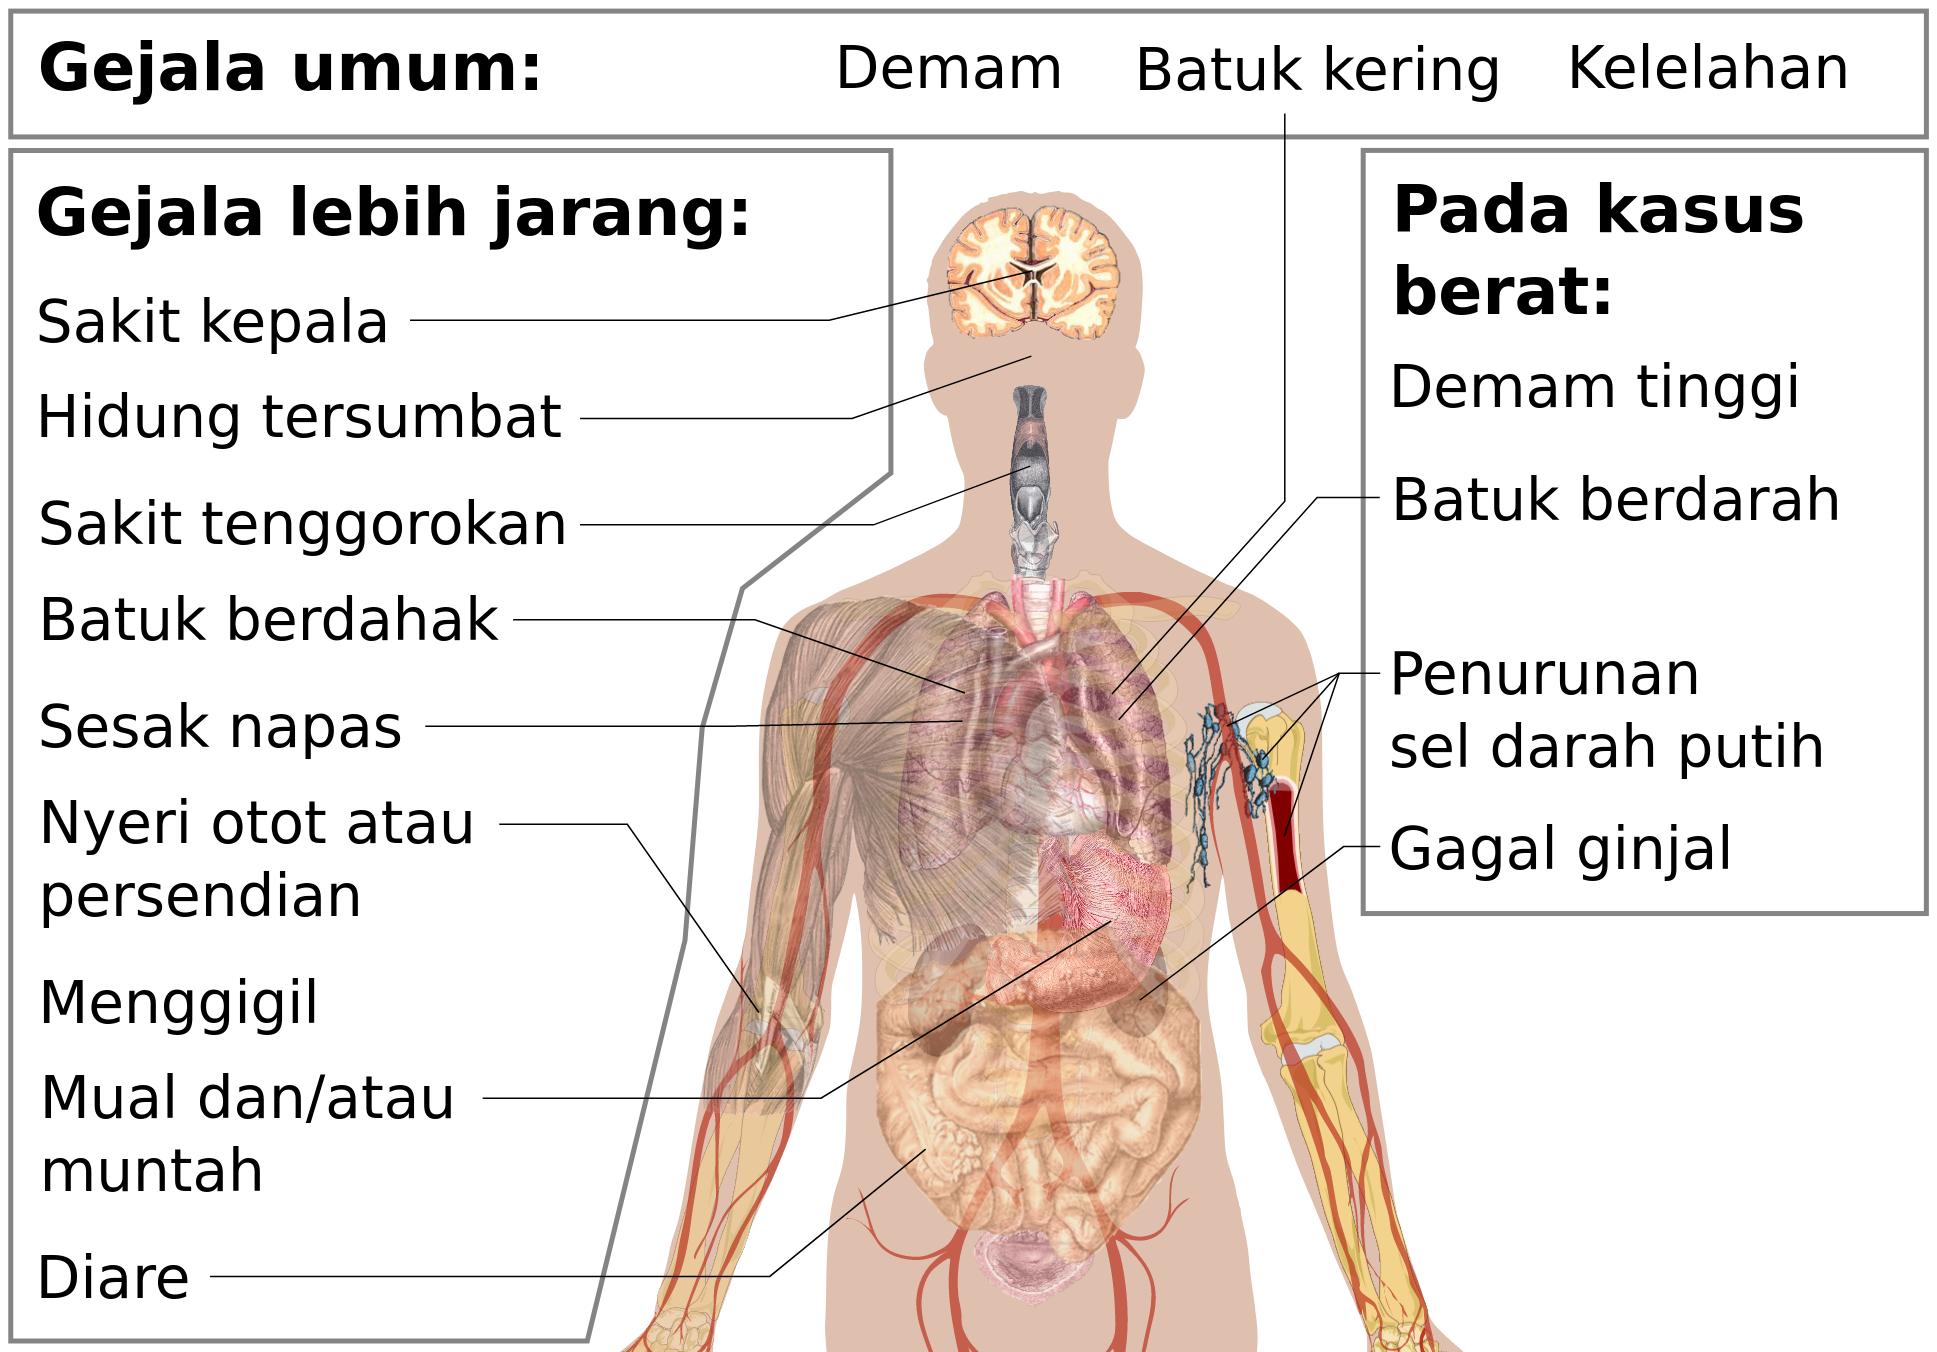 Penyakit Koronavirus 2019 Wikipedia Bahasa Indonesia Ensiklopedia Bebas